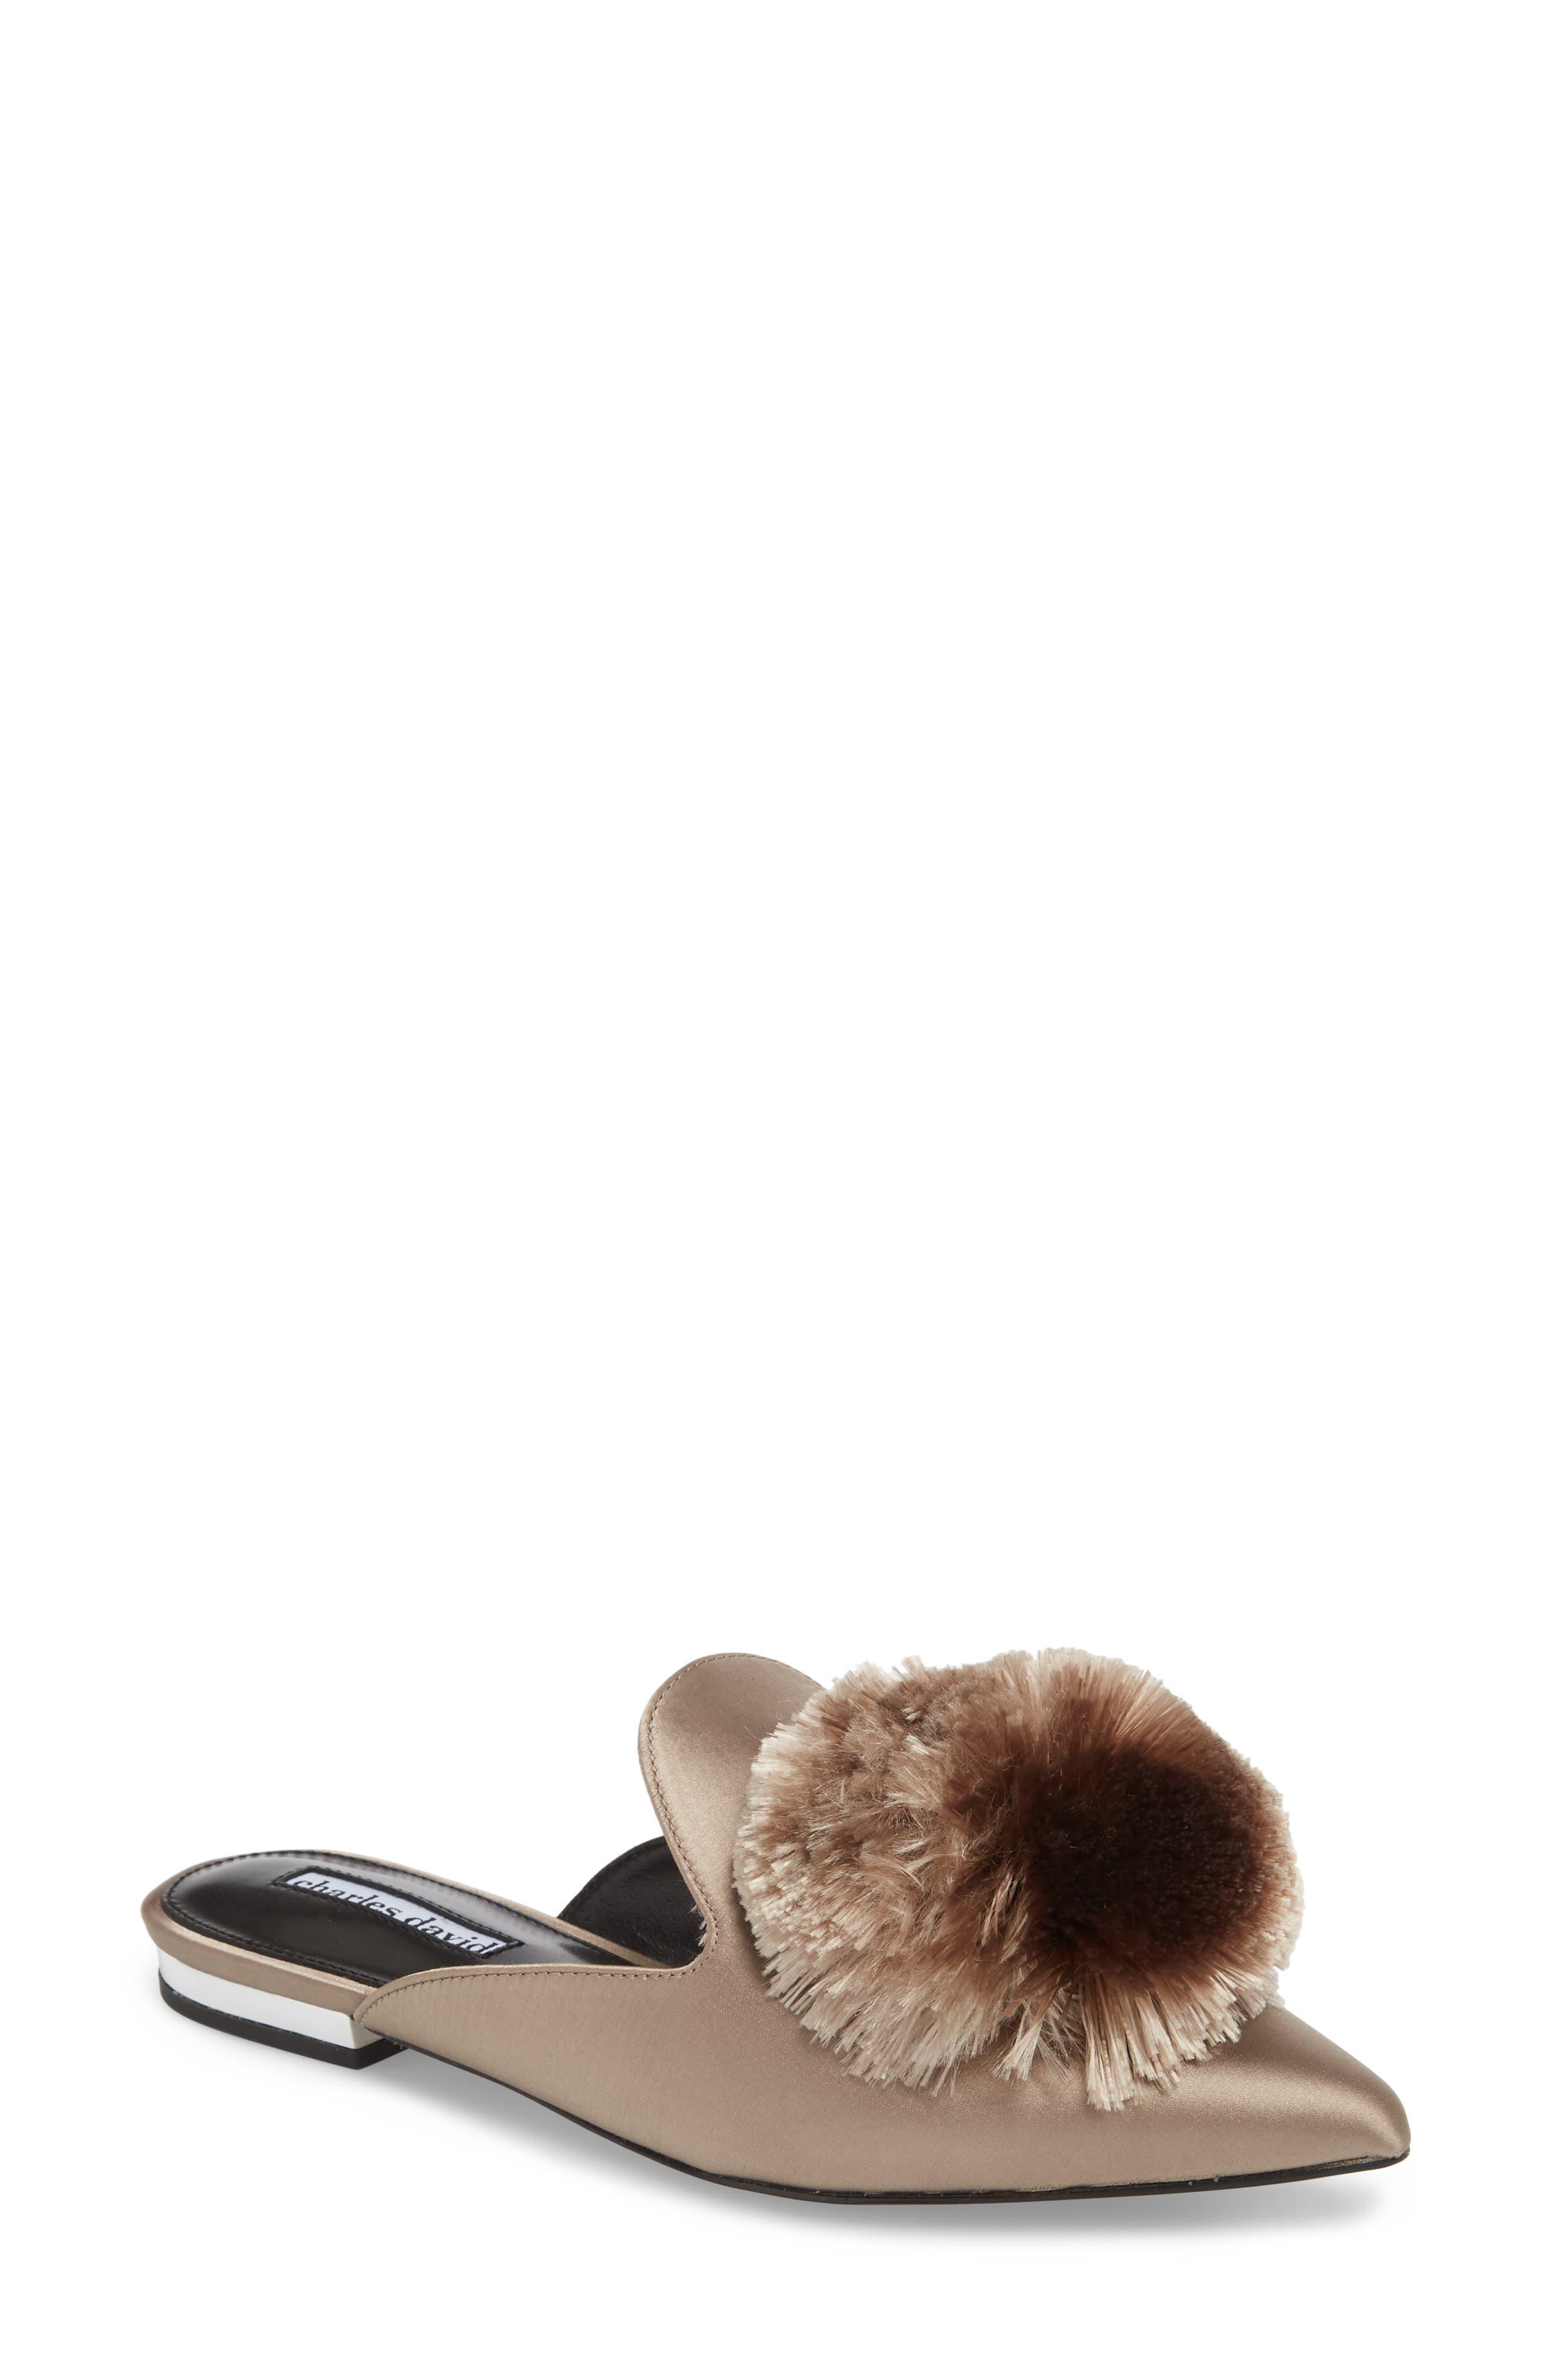 Wella Pompom Loafer Mule,                         Main,                         color, TAUPE SATIN